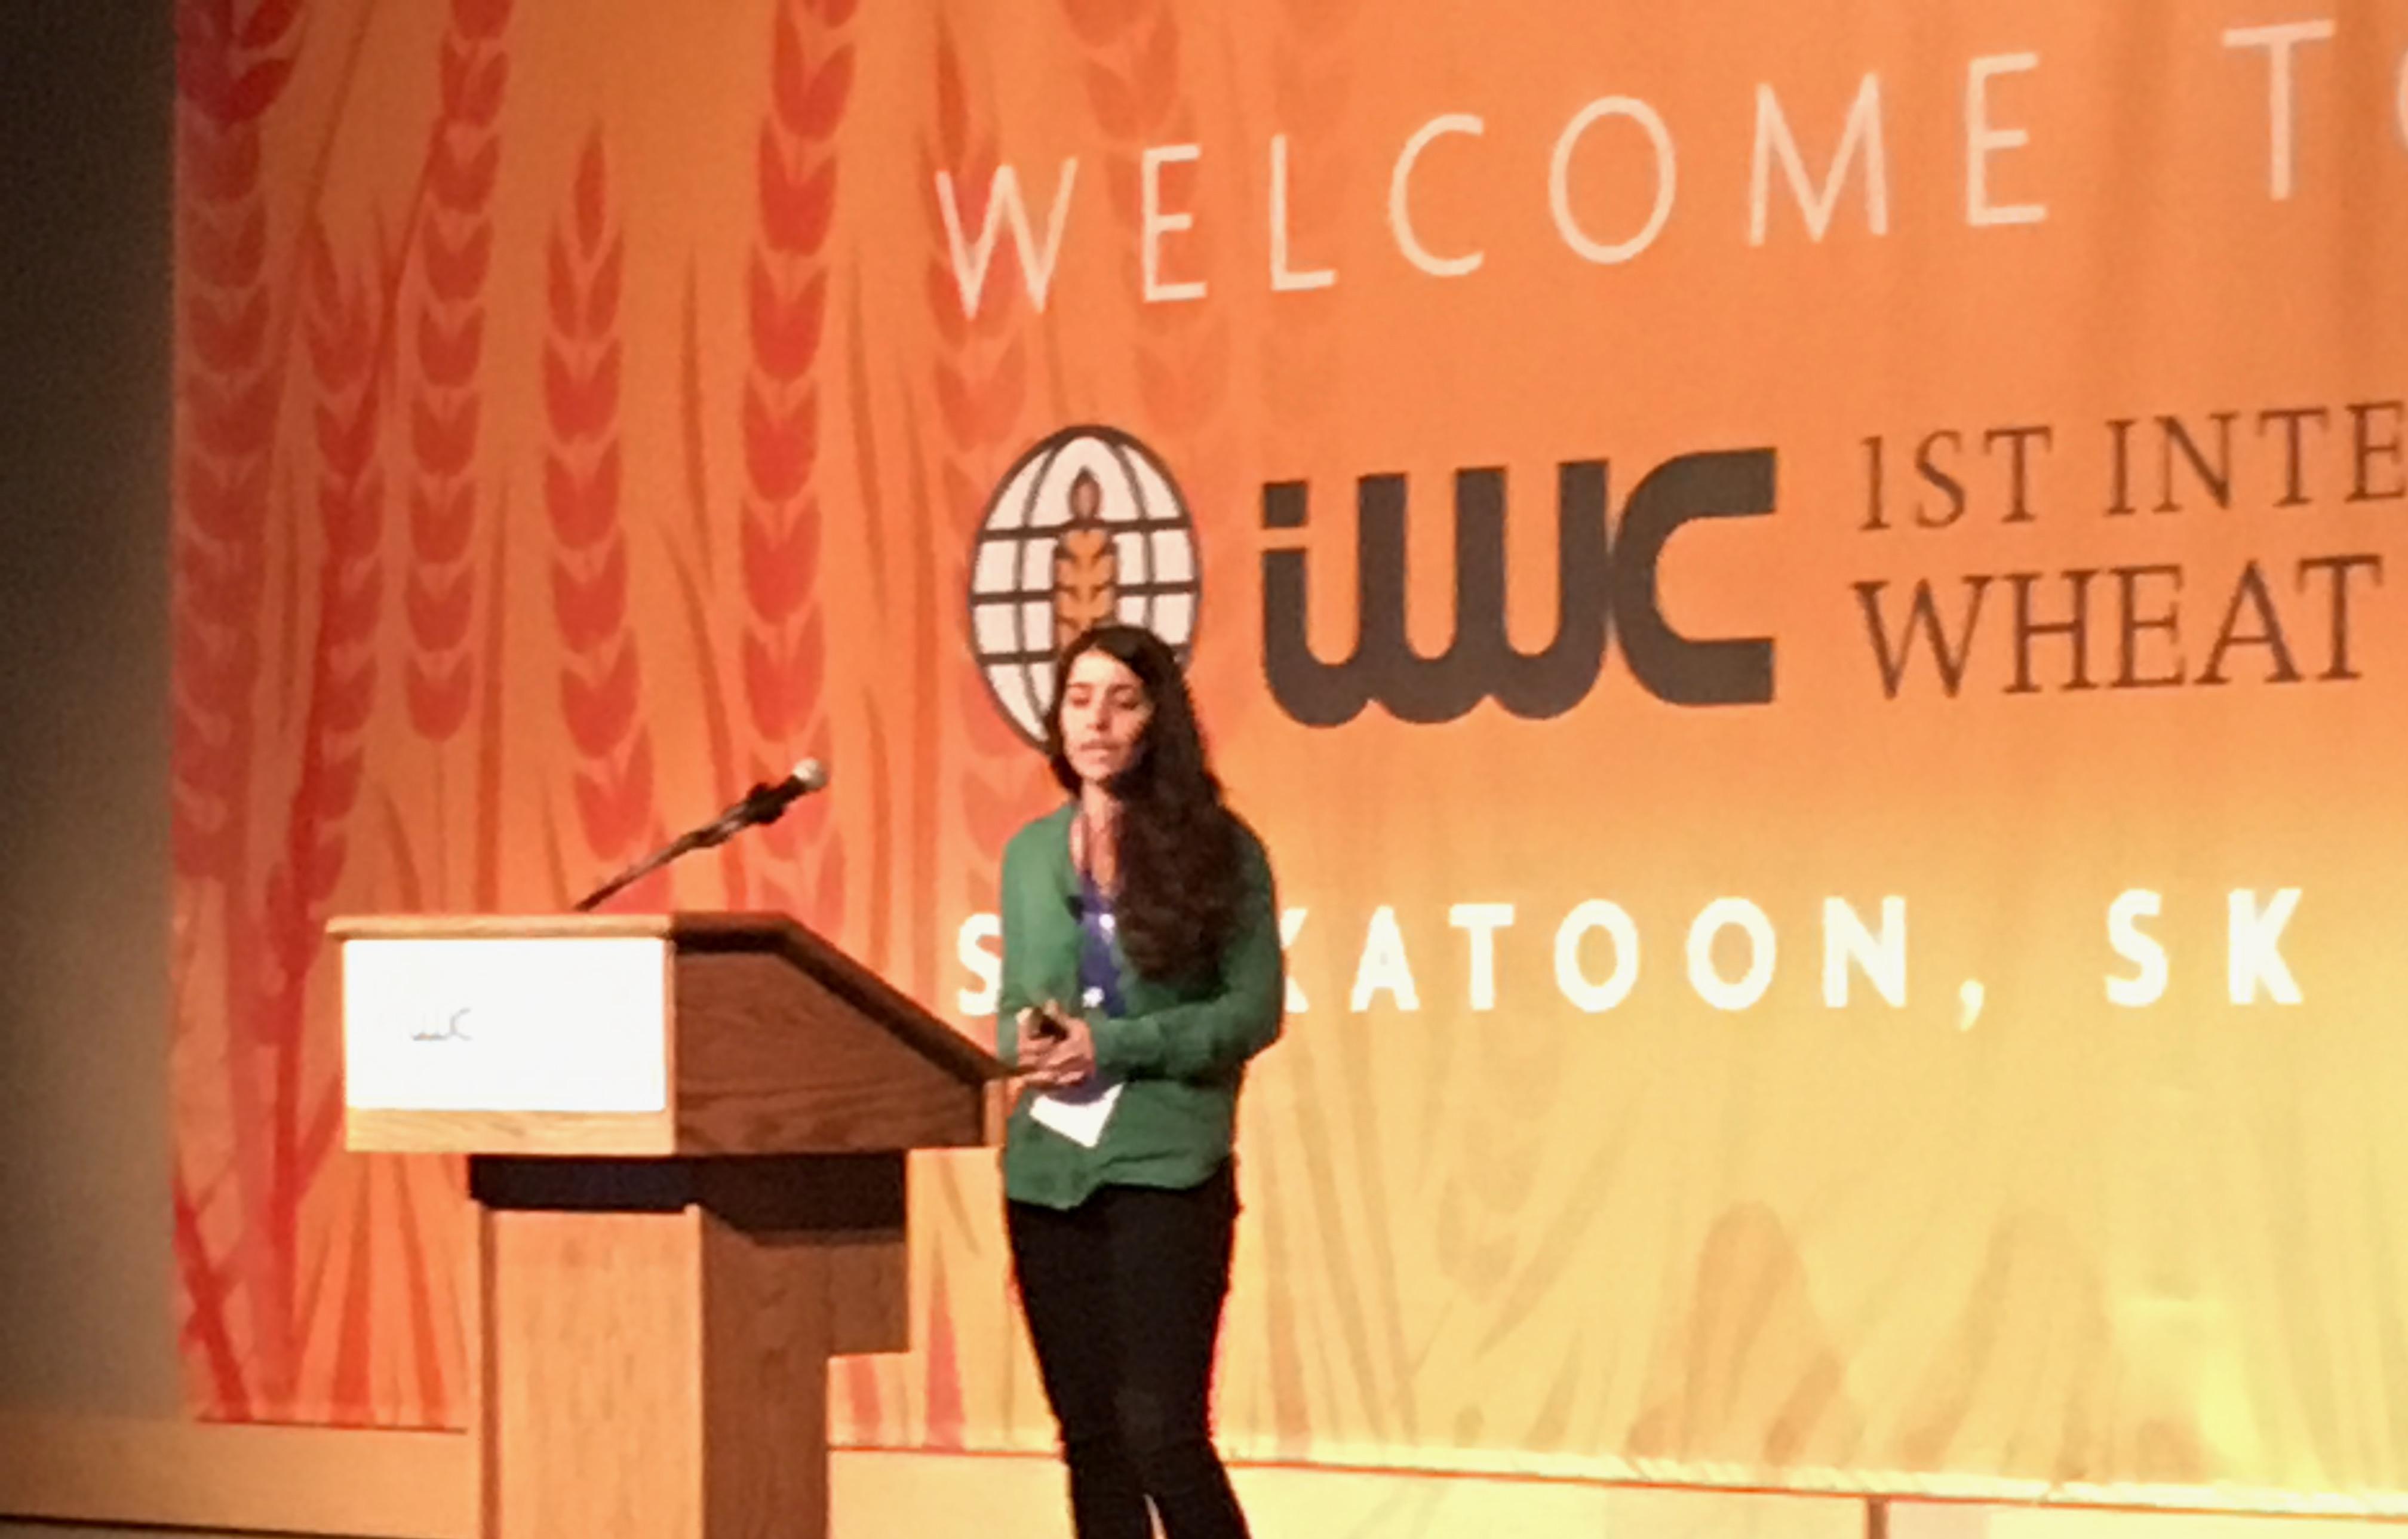 CIMMYT wheat physiologist Gemma Molero presents at the International Wheat Congress. (Photo: Marcia MacNeil/CIMMYT)